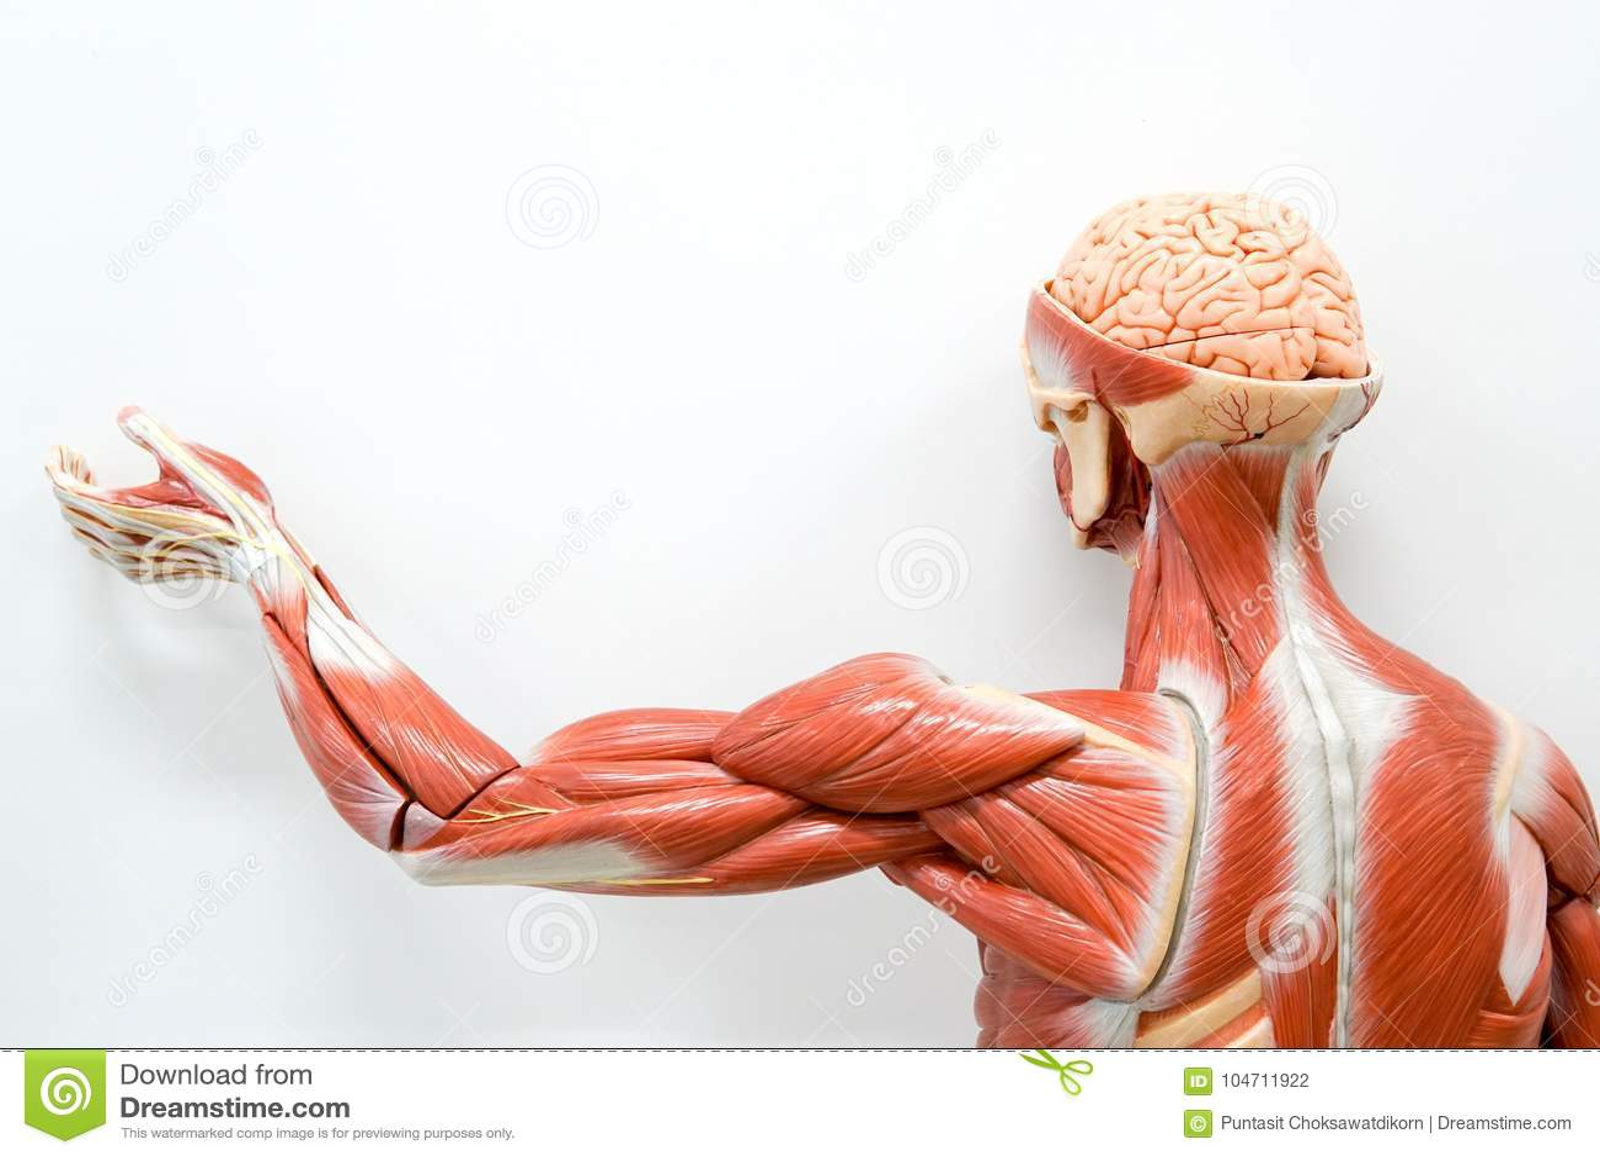 Human anatomy model stock photo. Image of model, design - 104711922